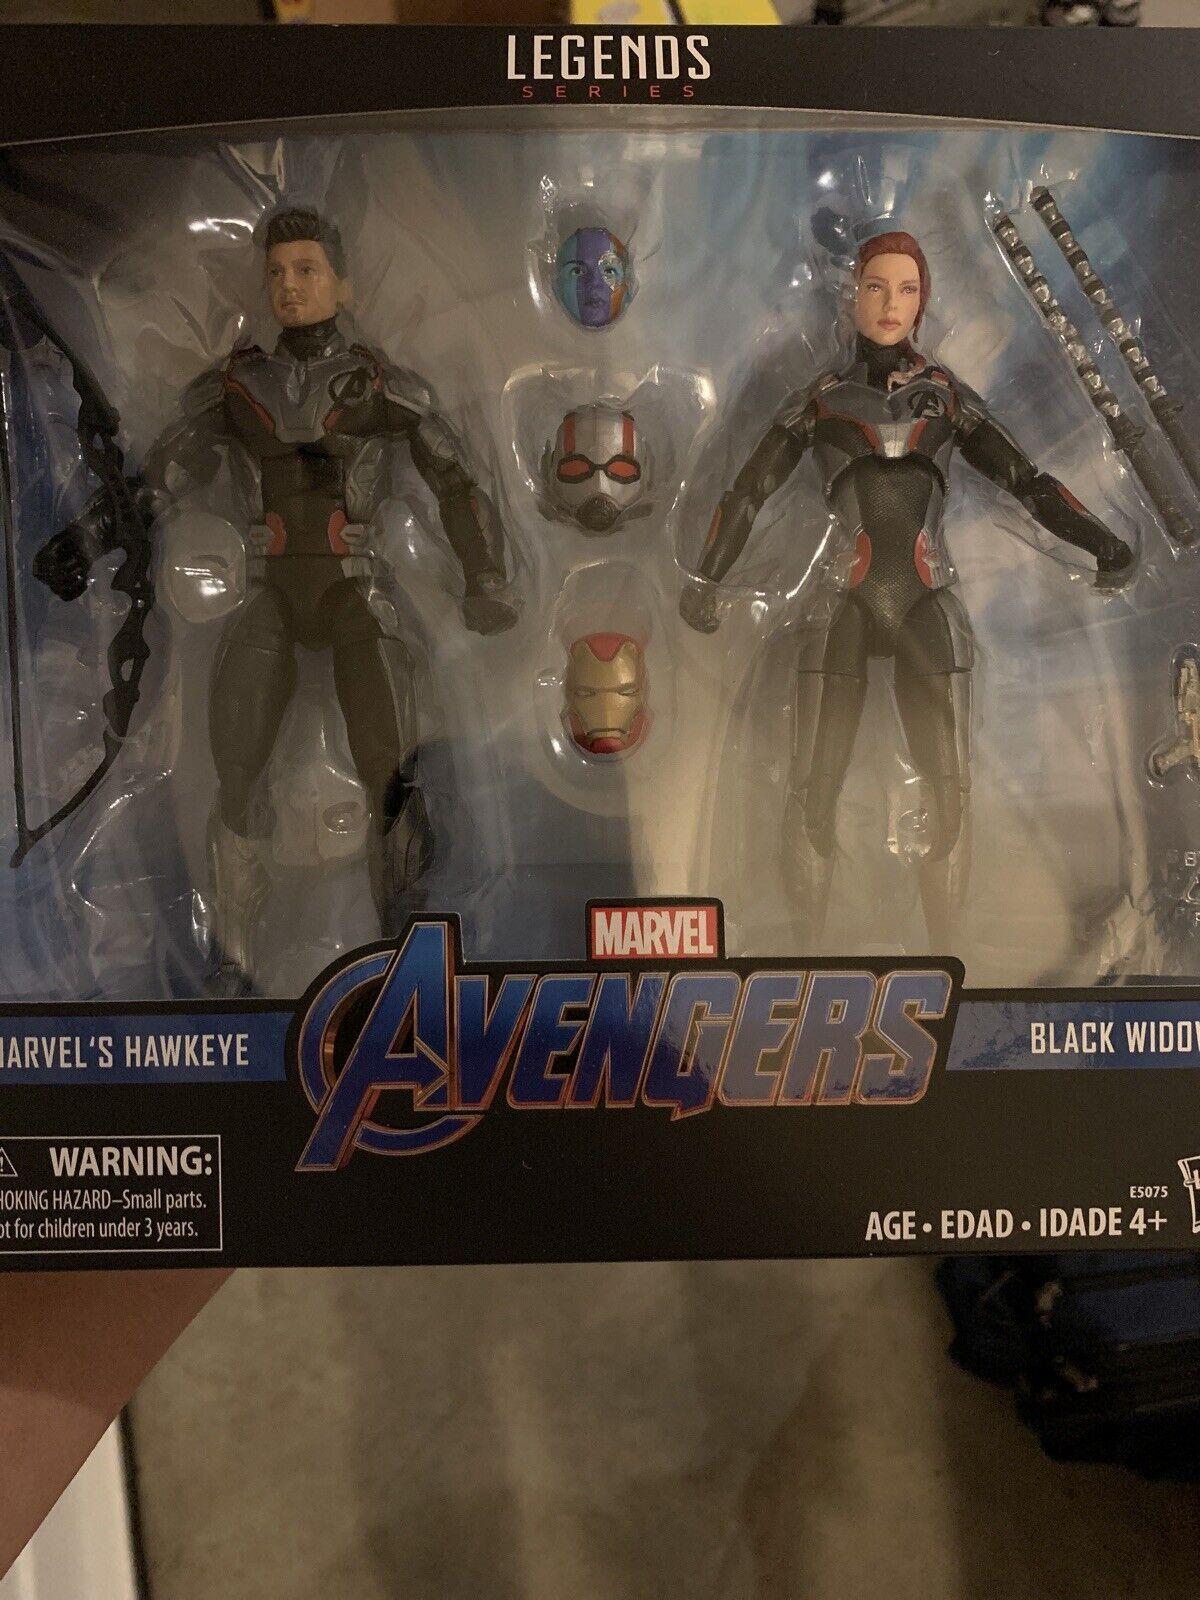 Marvel Legends Avengers Endgame 2 Pack Target Black Widow Hawkeye Iron Ant Man